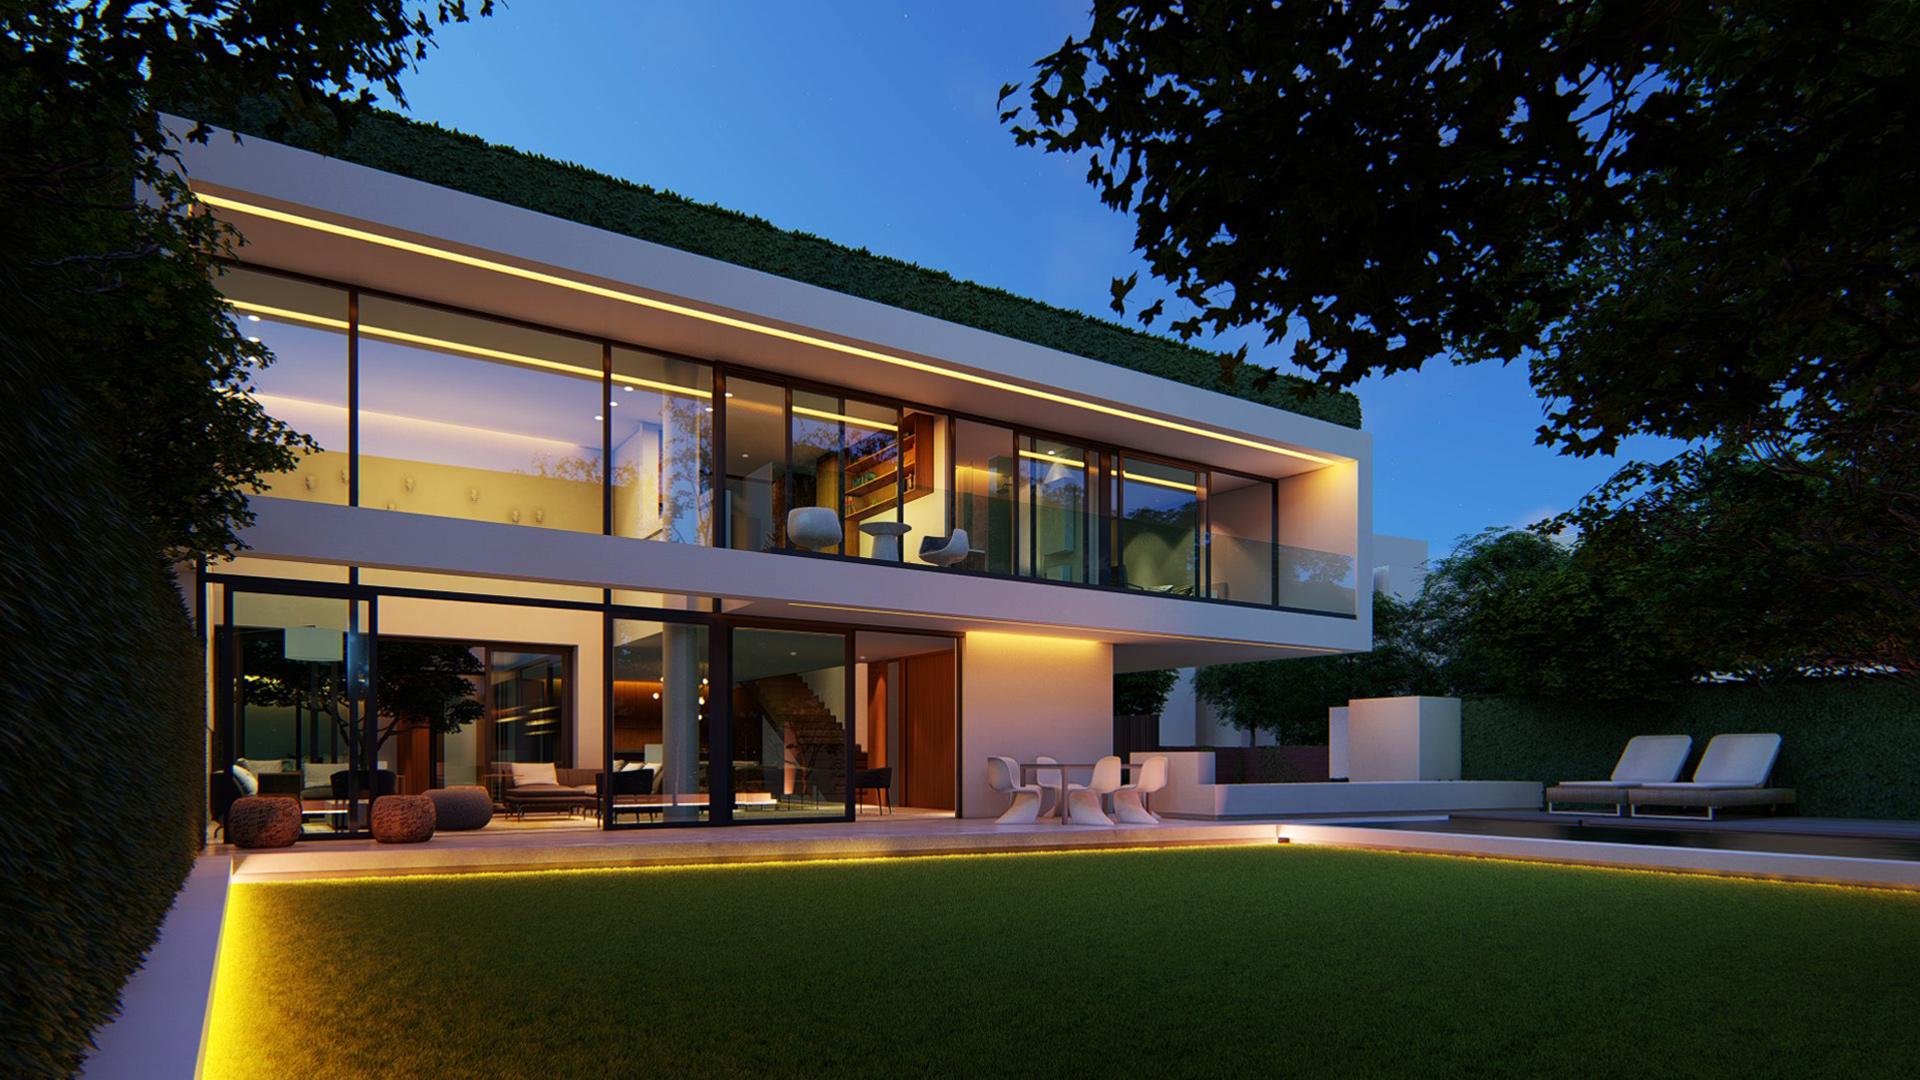 MAP_Design_House_Architecture_Modern_Architect_Kiran_Mathema_Veranda_Front_Facade